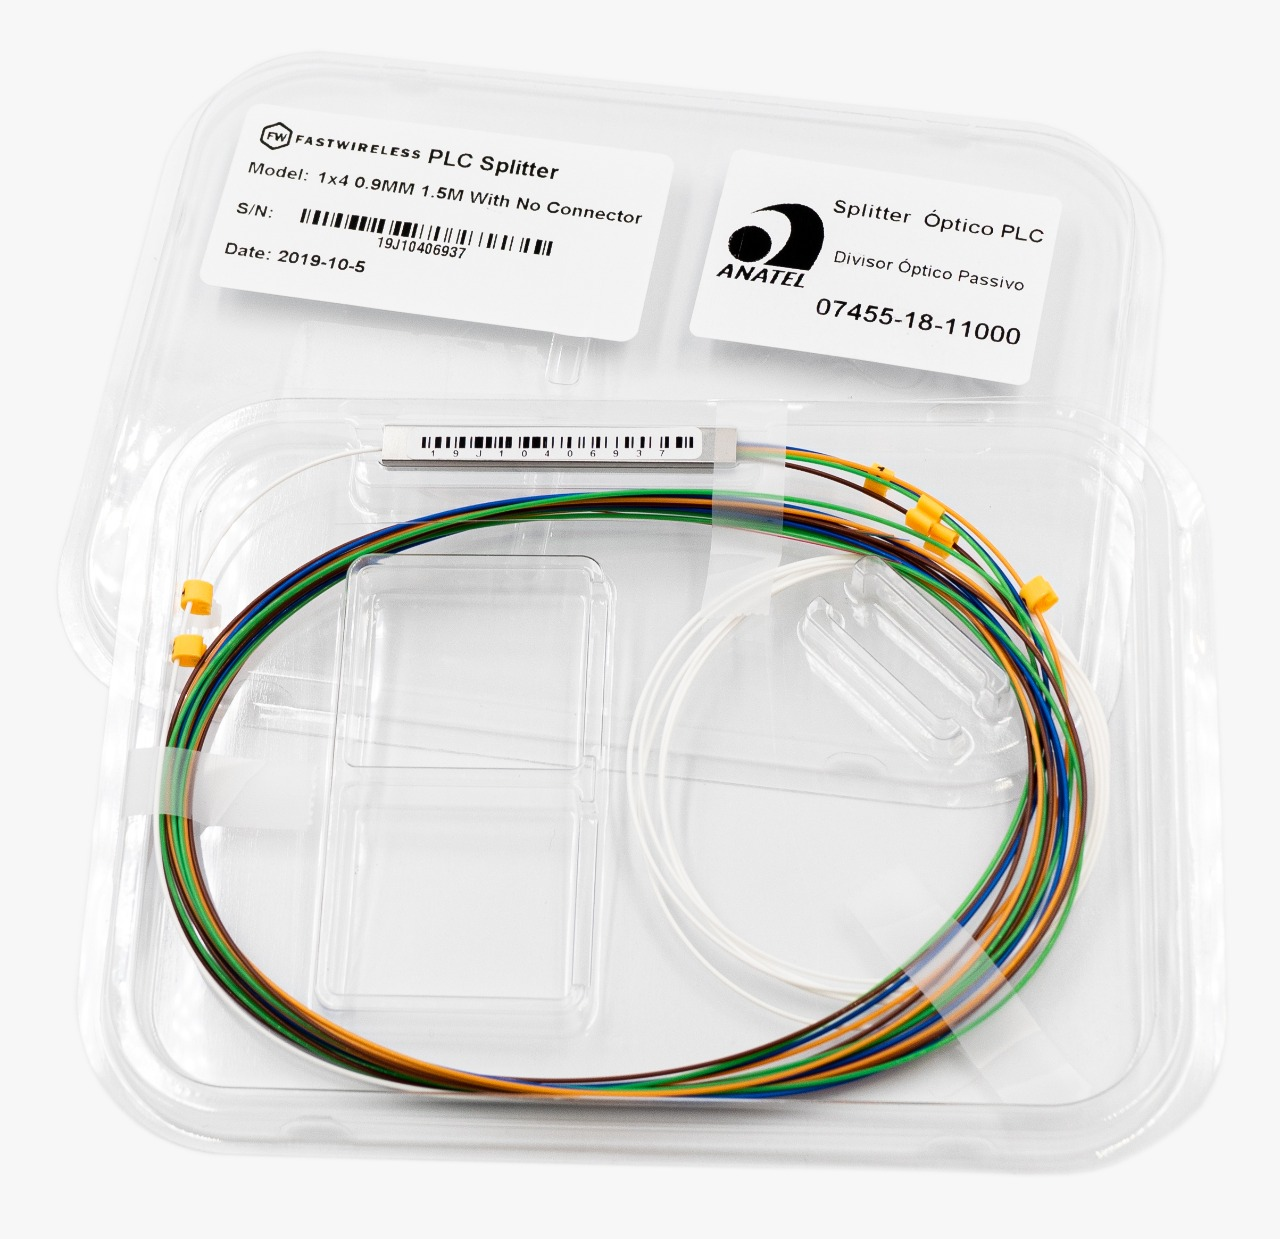 Splitter Óptico PLC 1x4 Desconectorizado  - FASTWIRELESS